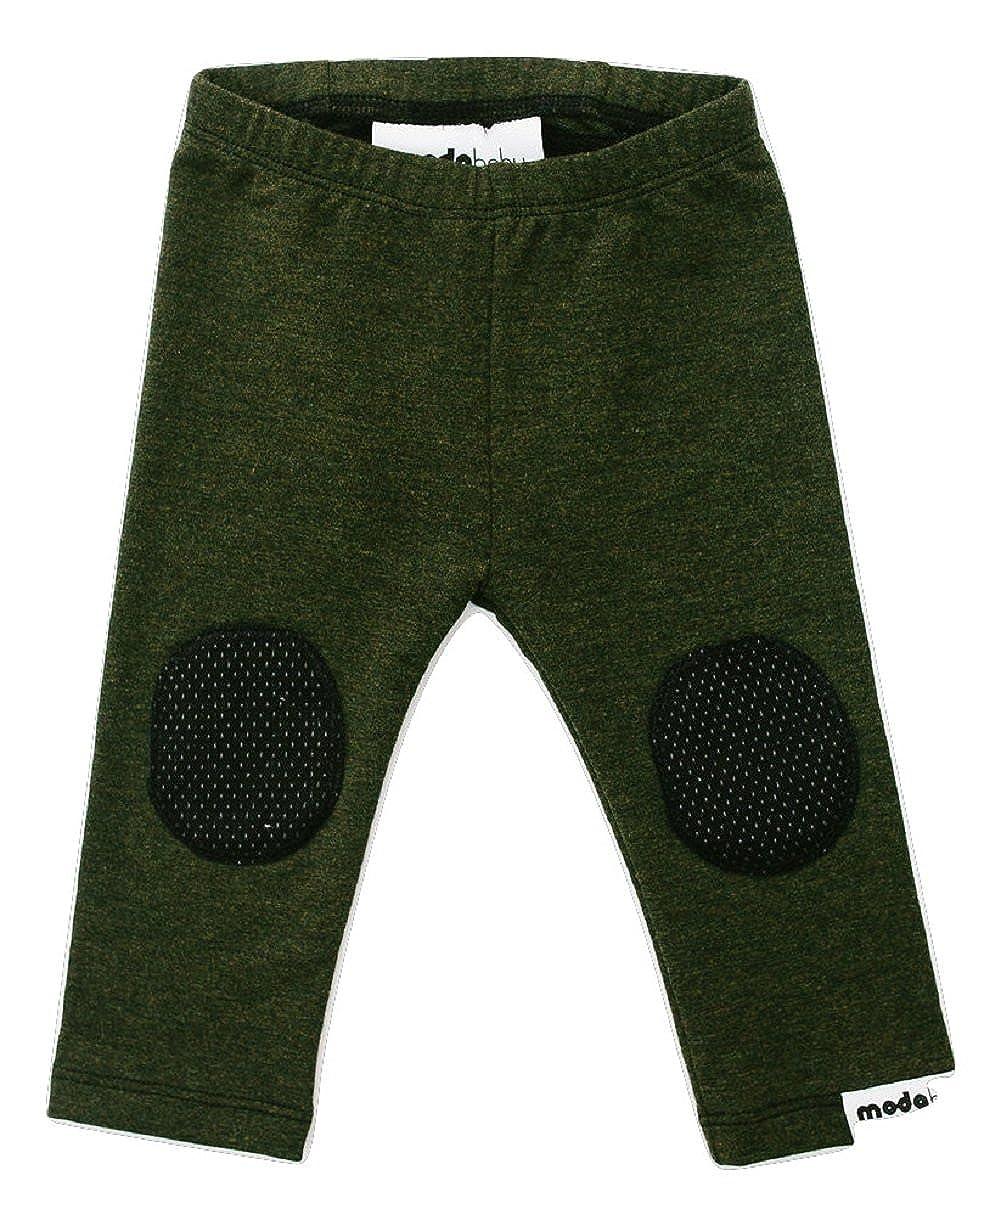 Buy Hypoallergenic Crawling Leggings Bamboo Fabric Baby Leggings Green Black 18 M At Amazon In